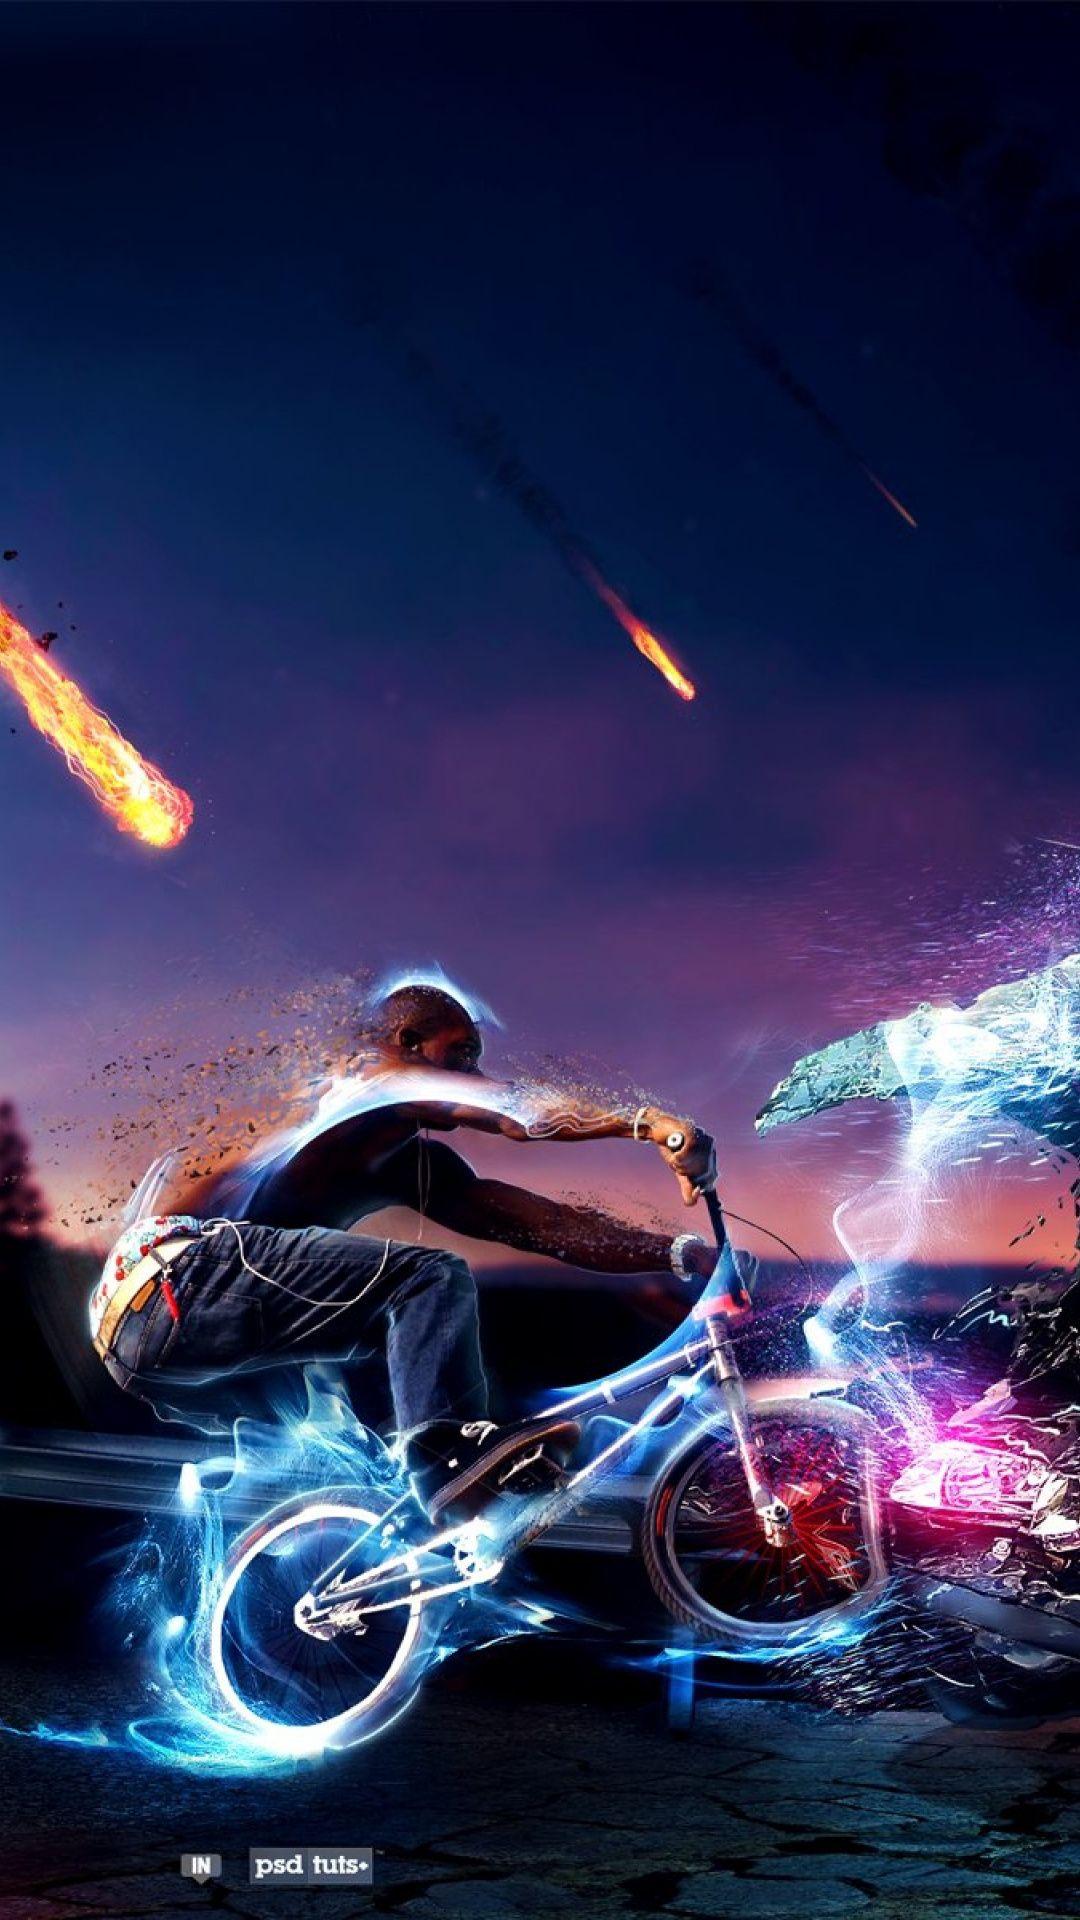 Wallpapers Bmx Bike Freestyle Bmx Light Motorcycle Sky